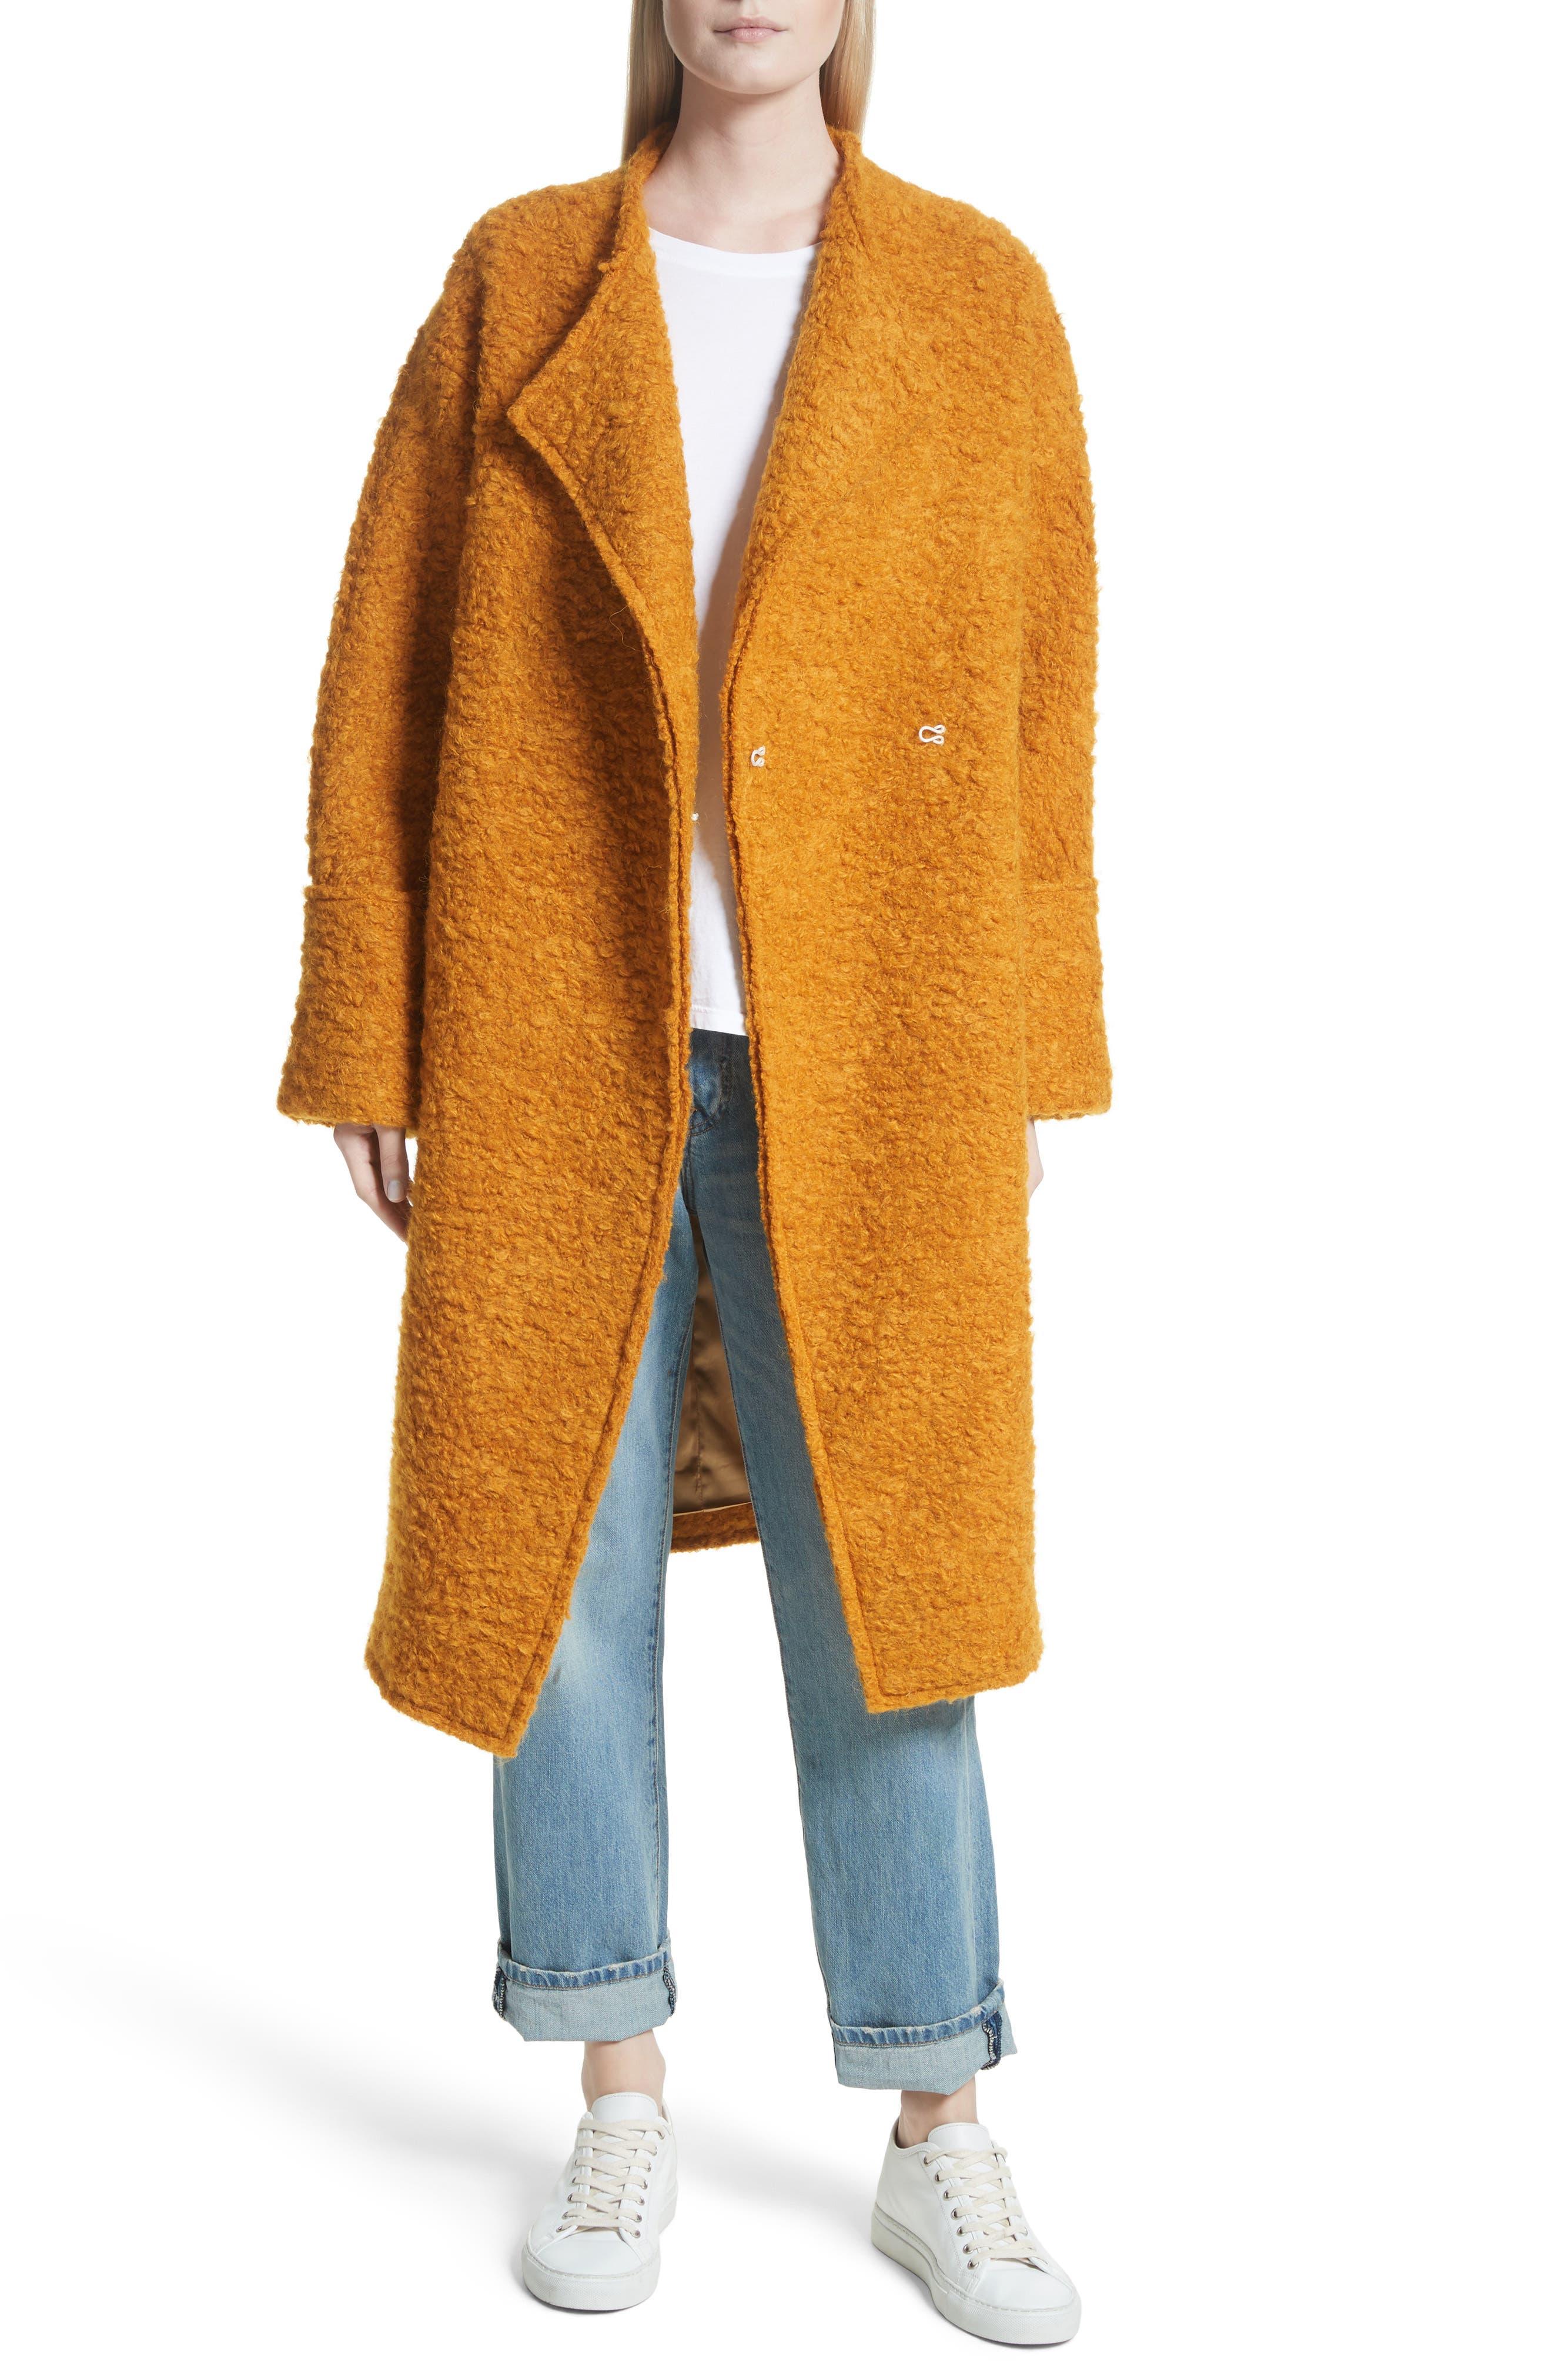 Elizabeth and James Paloma Wool, Mohair & Alpaca Blend Coat